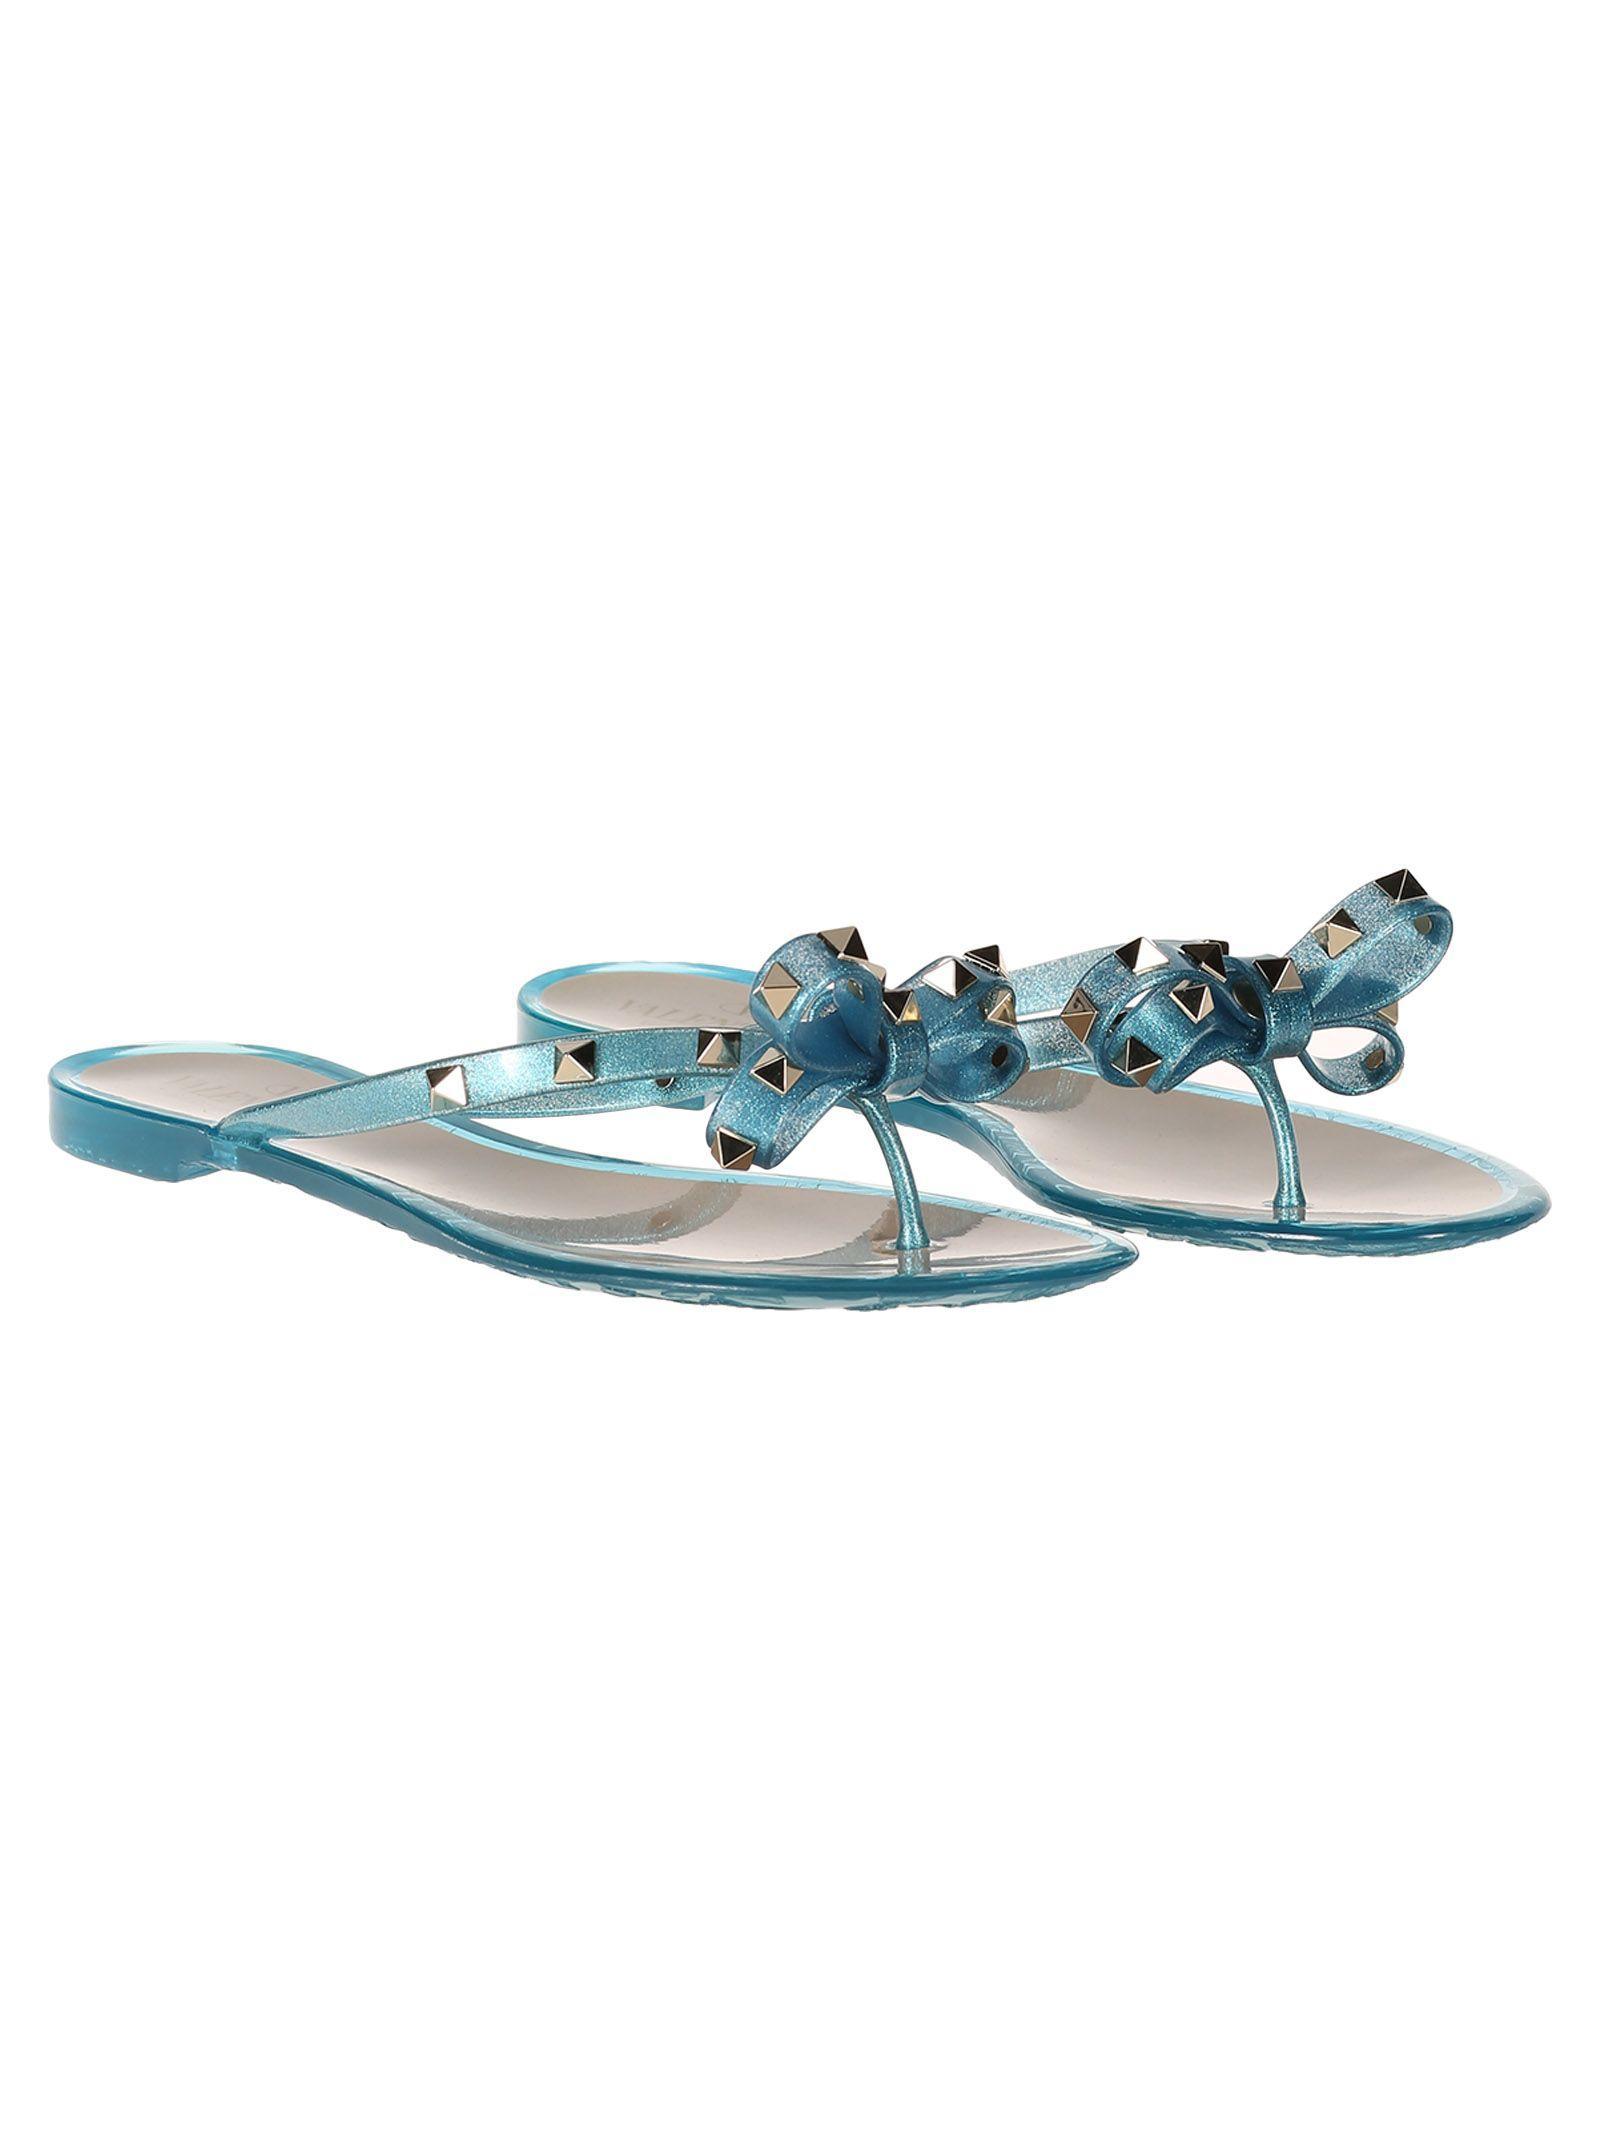 Valentino Garavani Studs Slippers In Light Blue